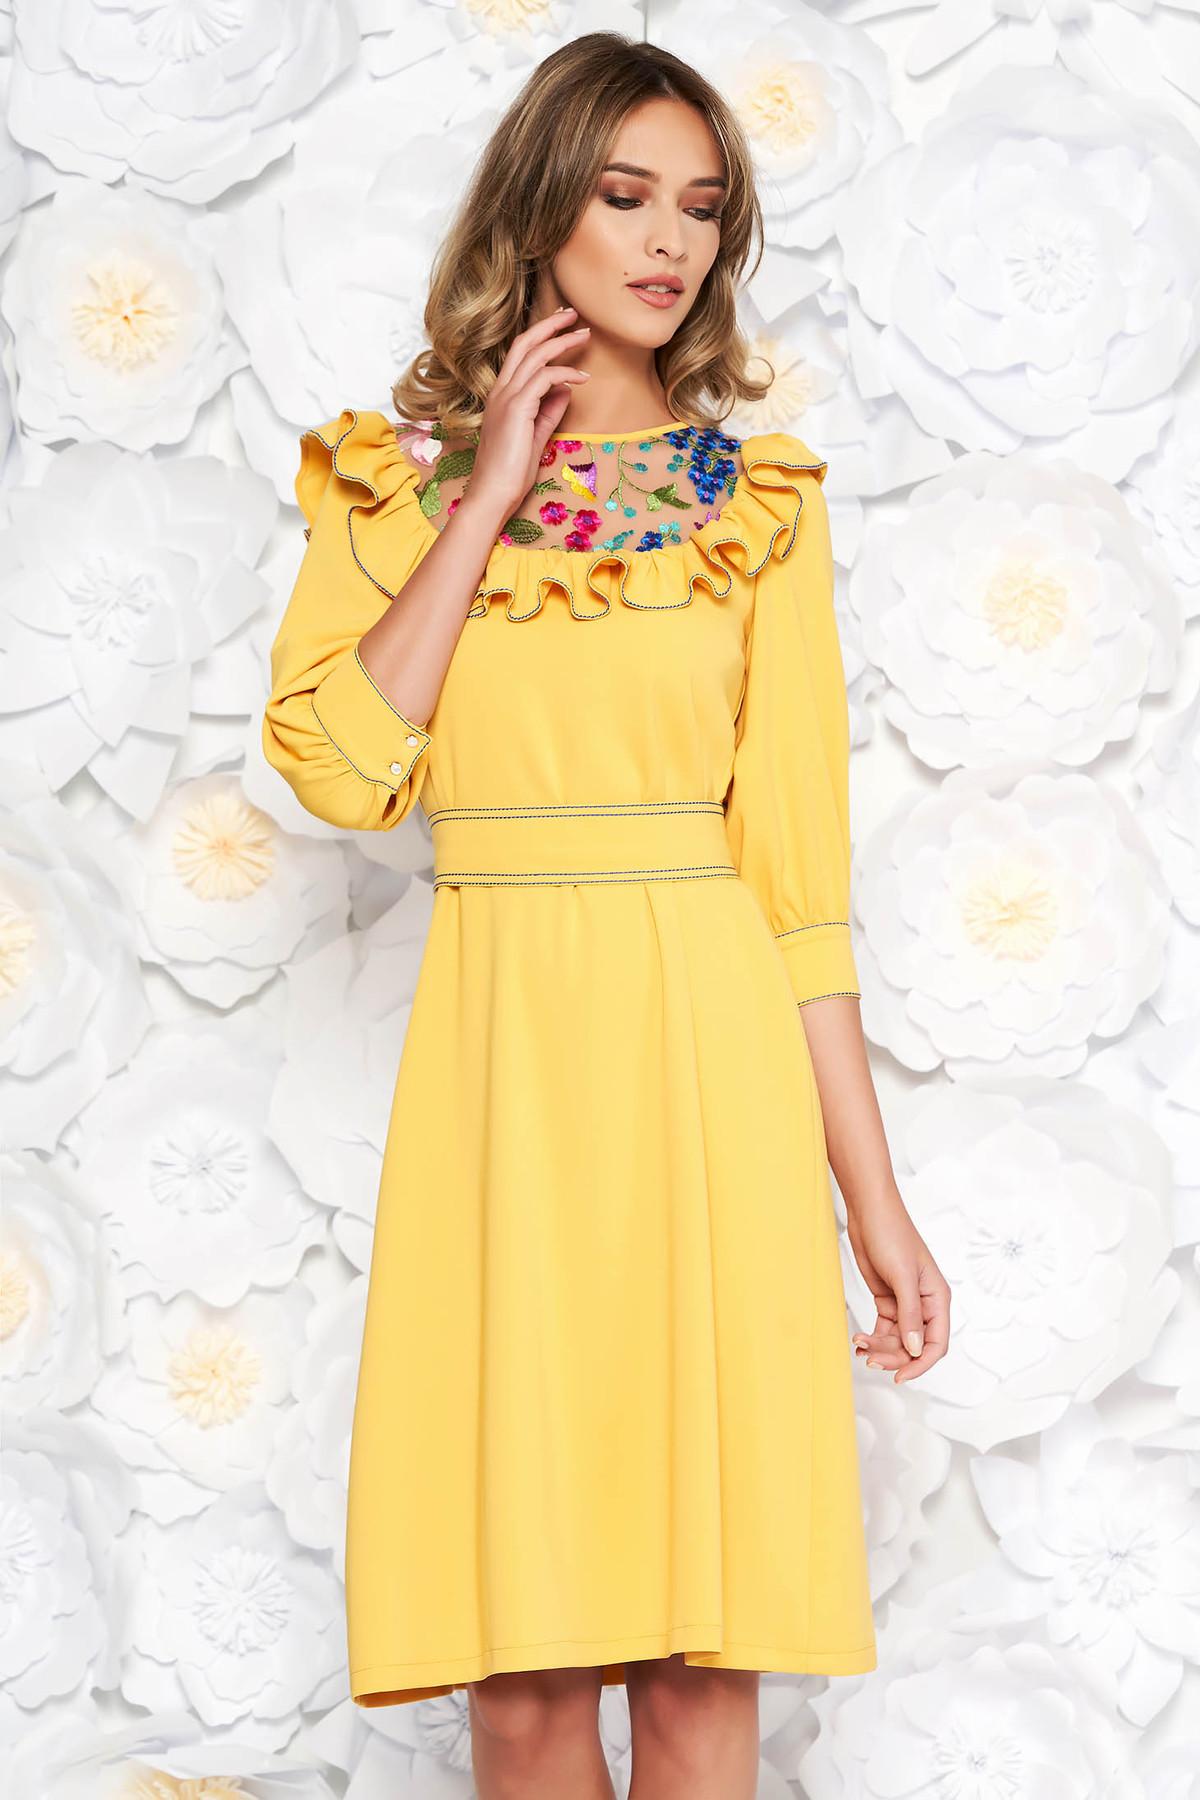 Rochie LaDonna galbena eleganta brodata cu croi larg din stofa subtire usor elastica captusita pe interior accesorizata cu cordon